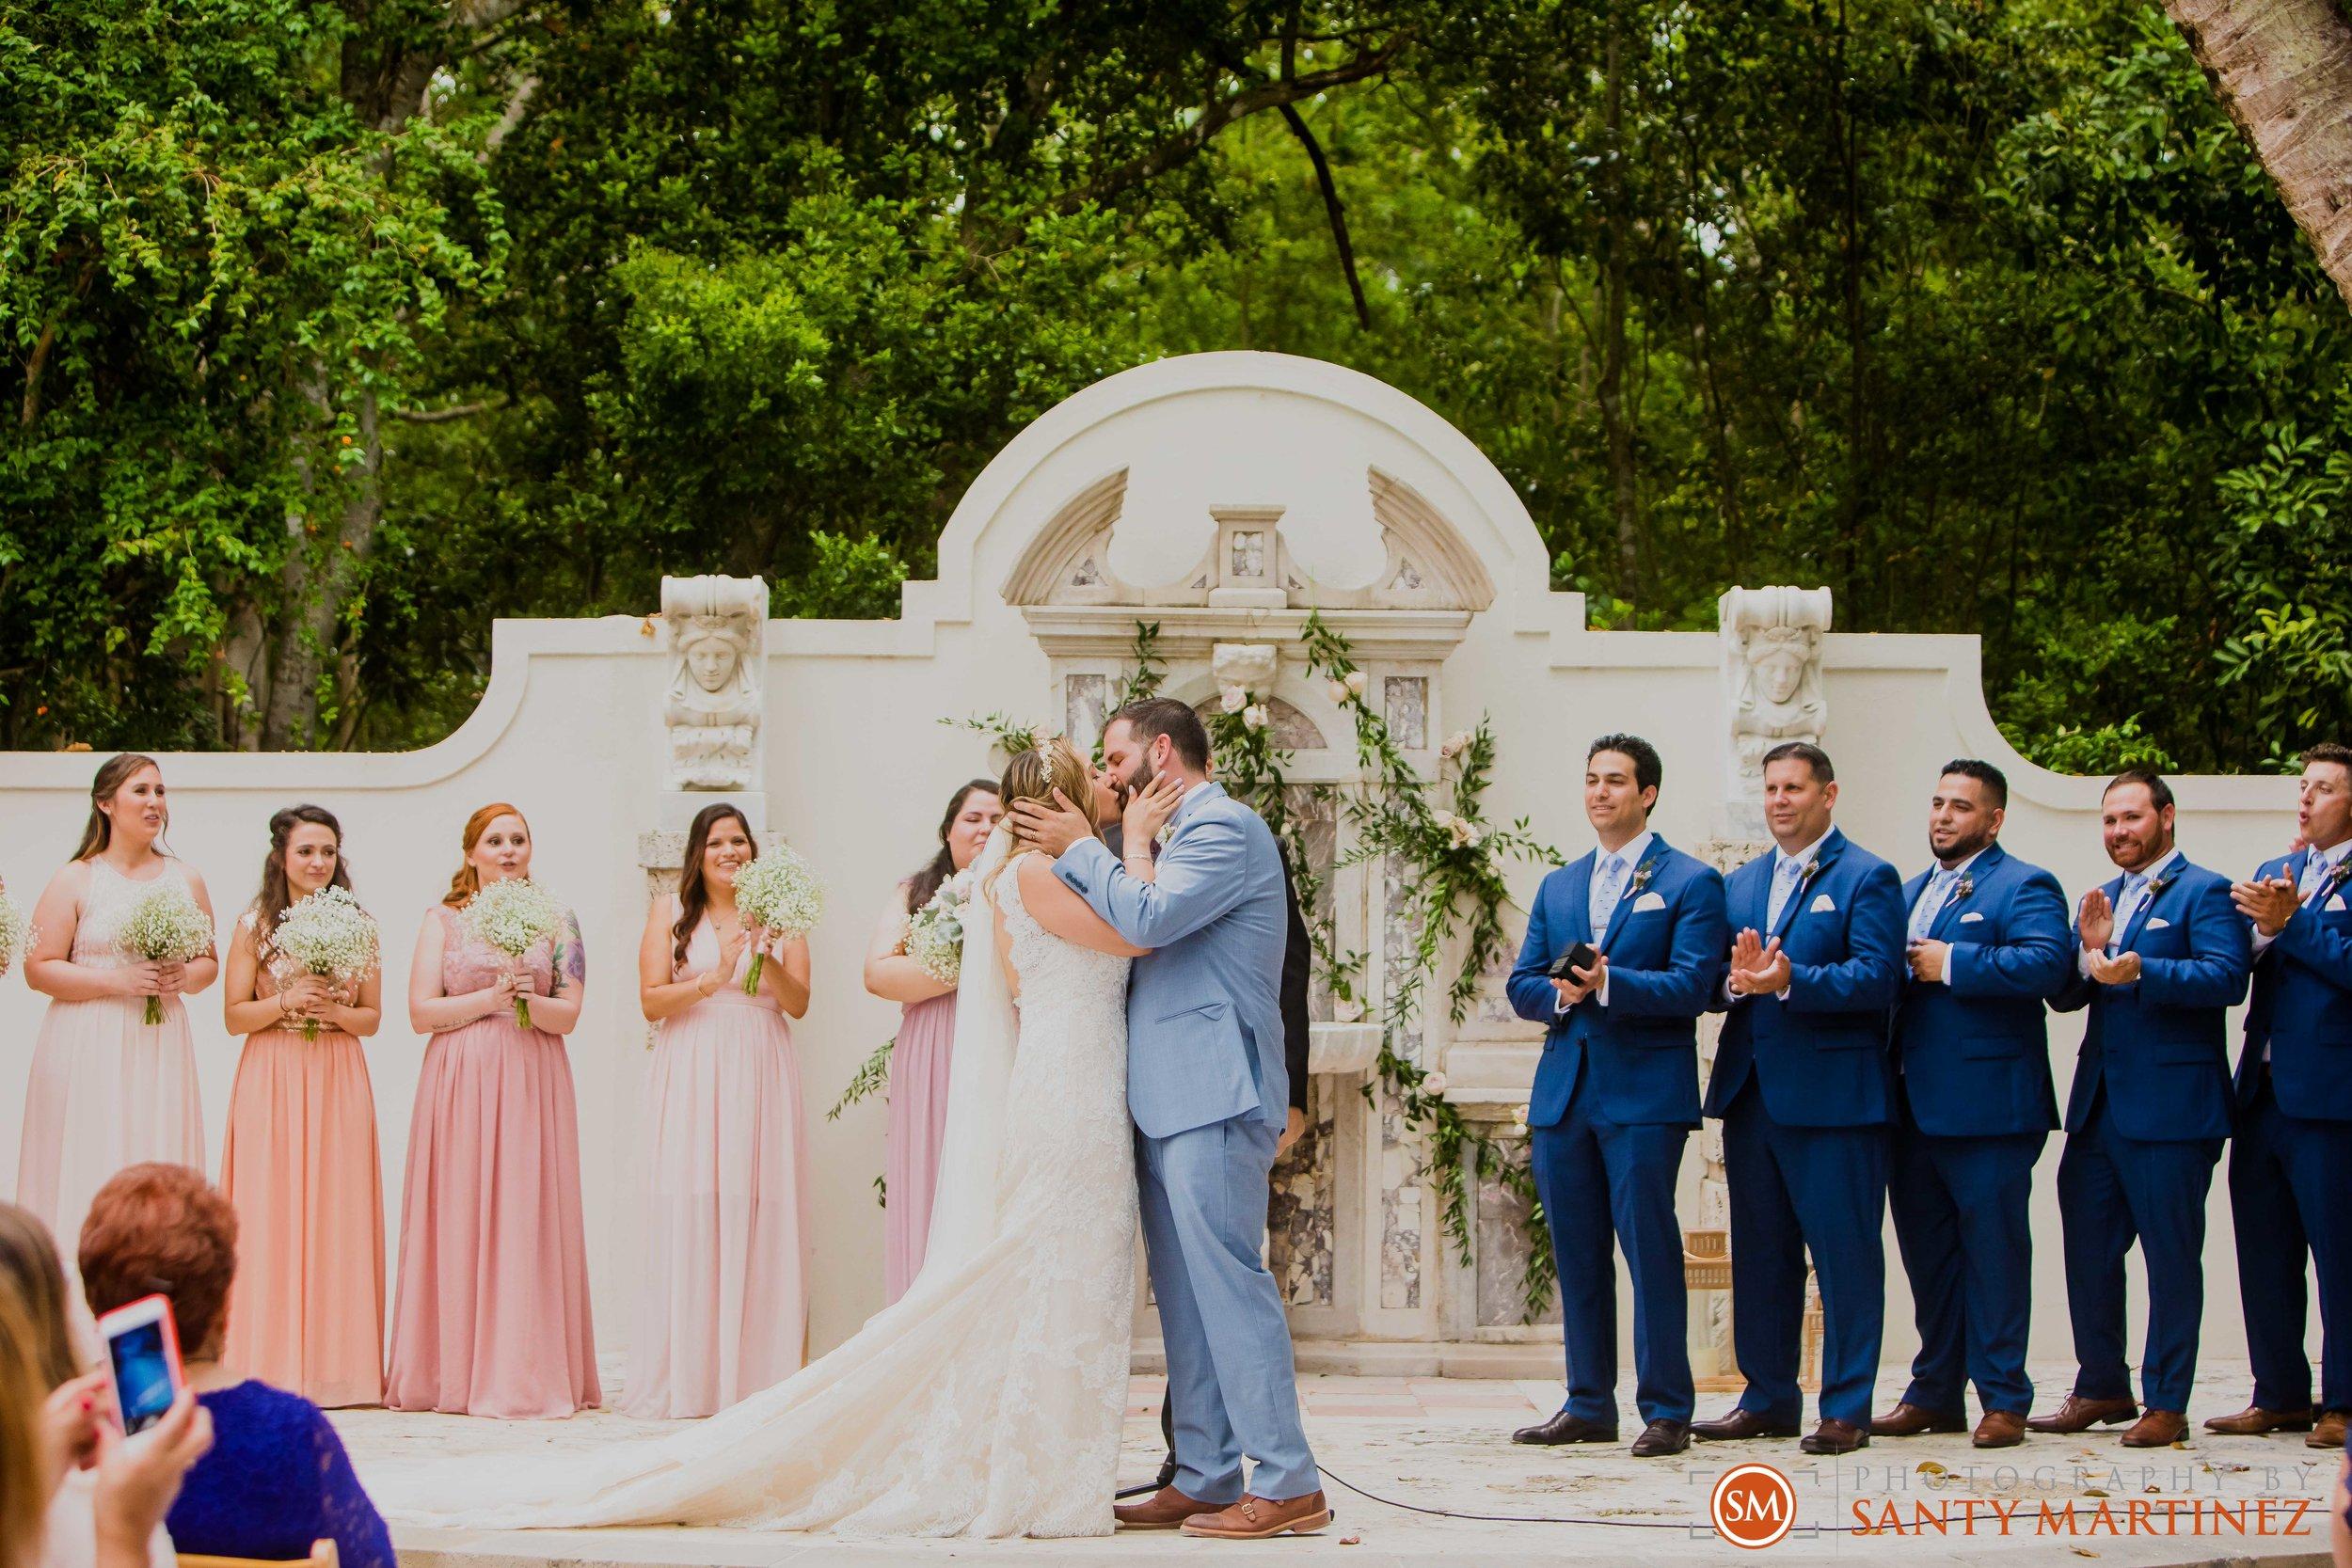 Wedding Bonnet House - Santy Martinez Photography-37.jpg